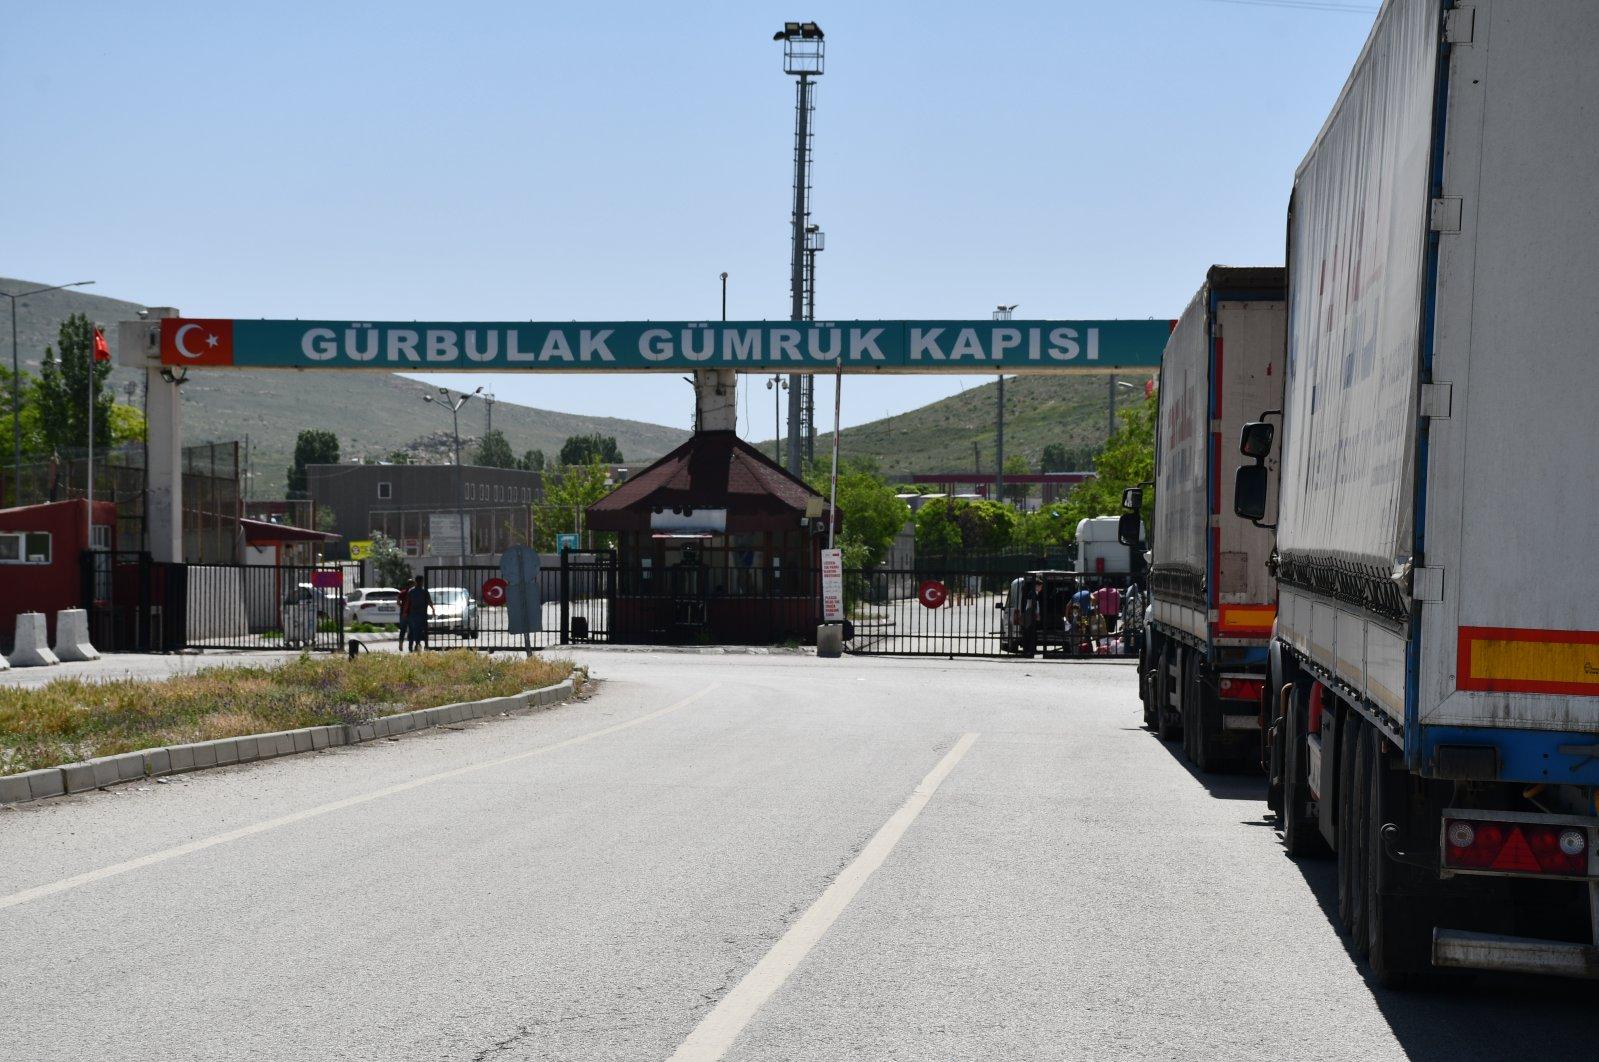 Trucks are seen at the Gürbulak border gate in eastern Turkey's Ağrı province along the Iranian border, June 4, 2020. (AA Photo)